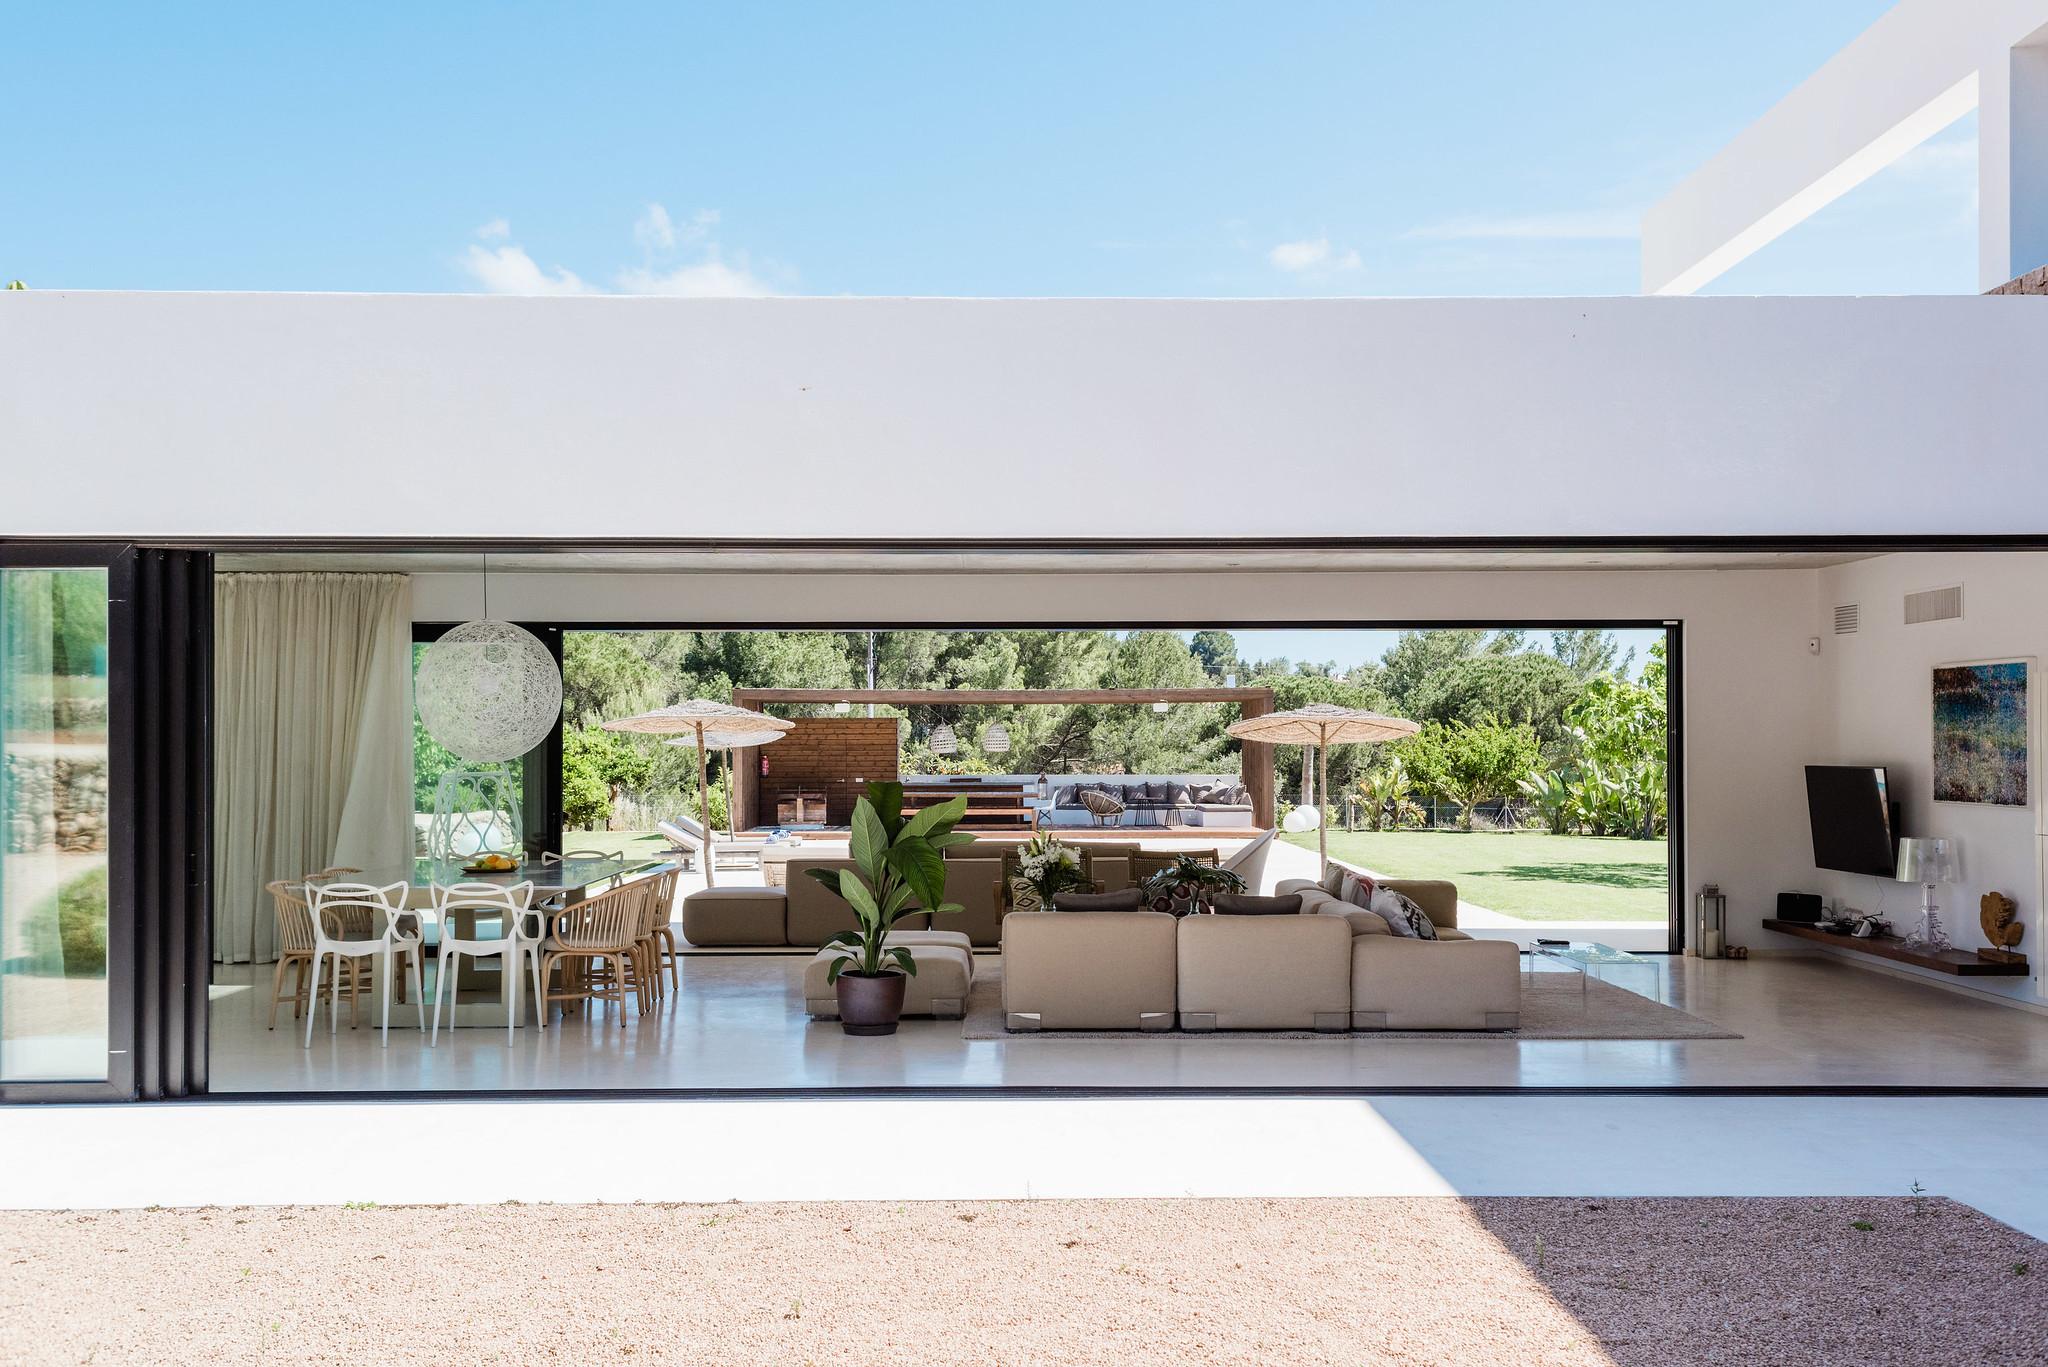 https://www.white-ibiza.com/wp-content/uploads/2020/06/white-ibiza-villas-can-carmen-exterior-view-through-house.jpg